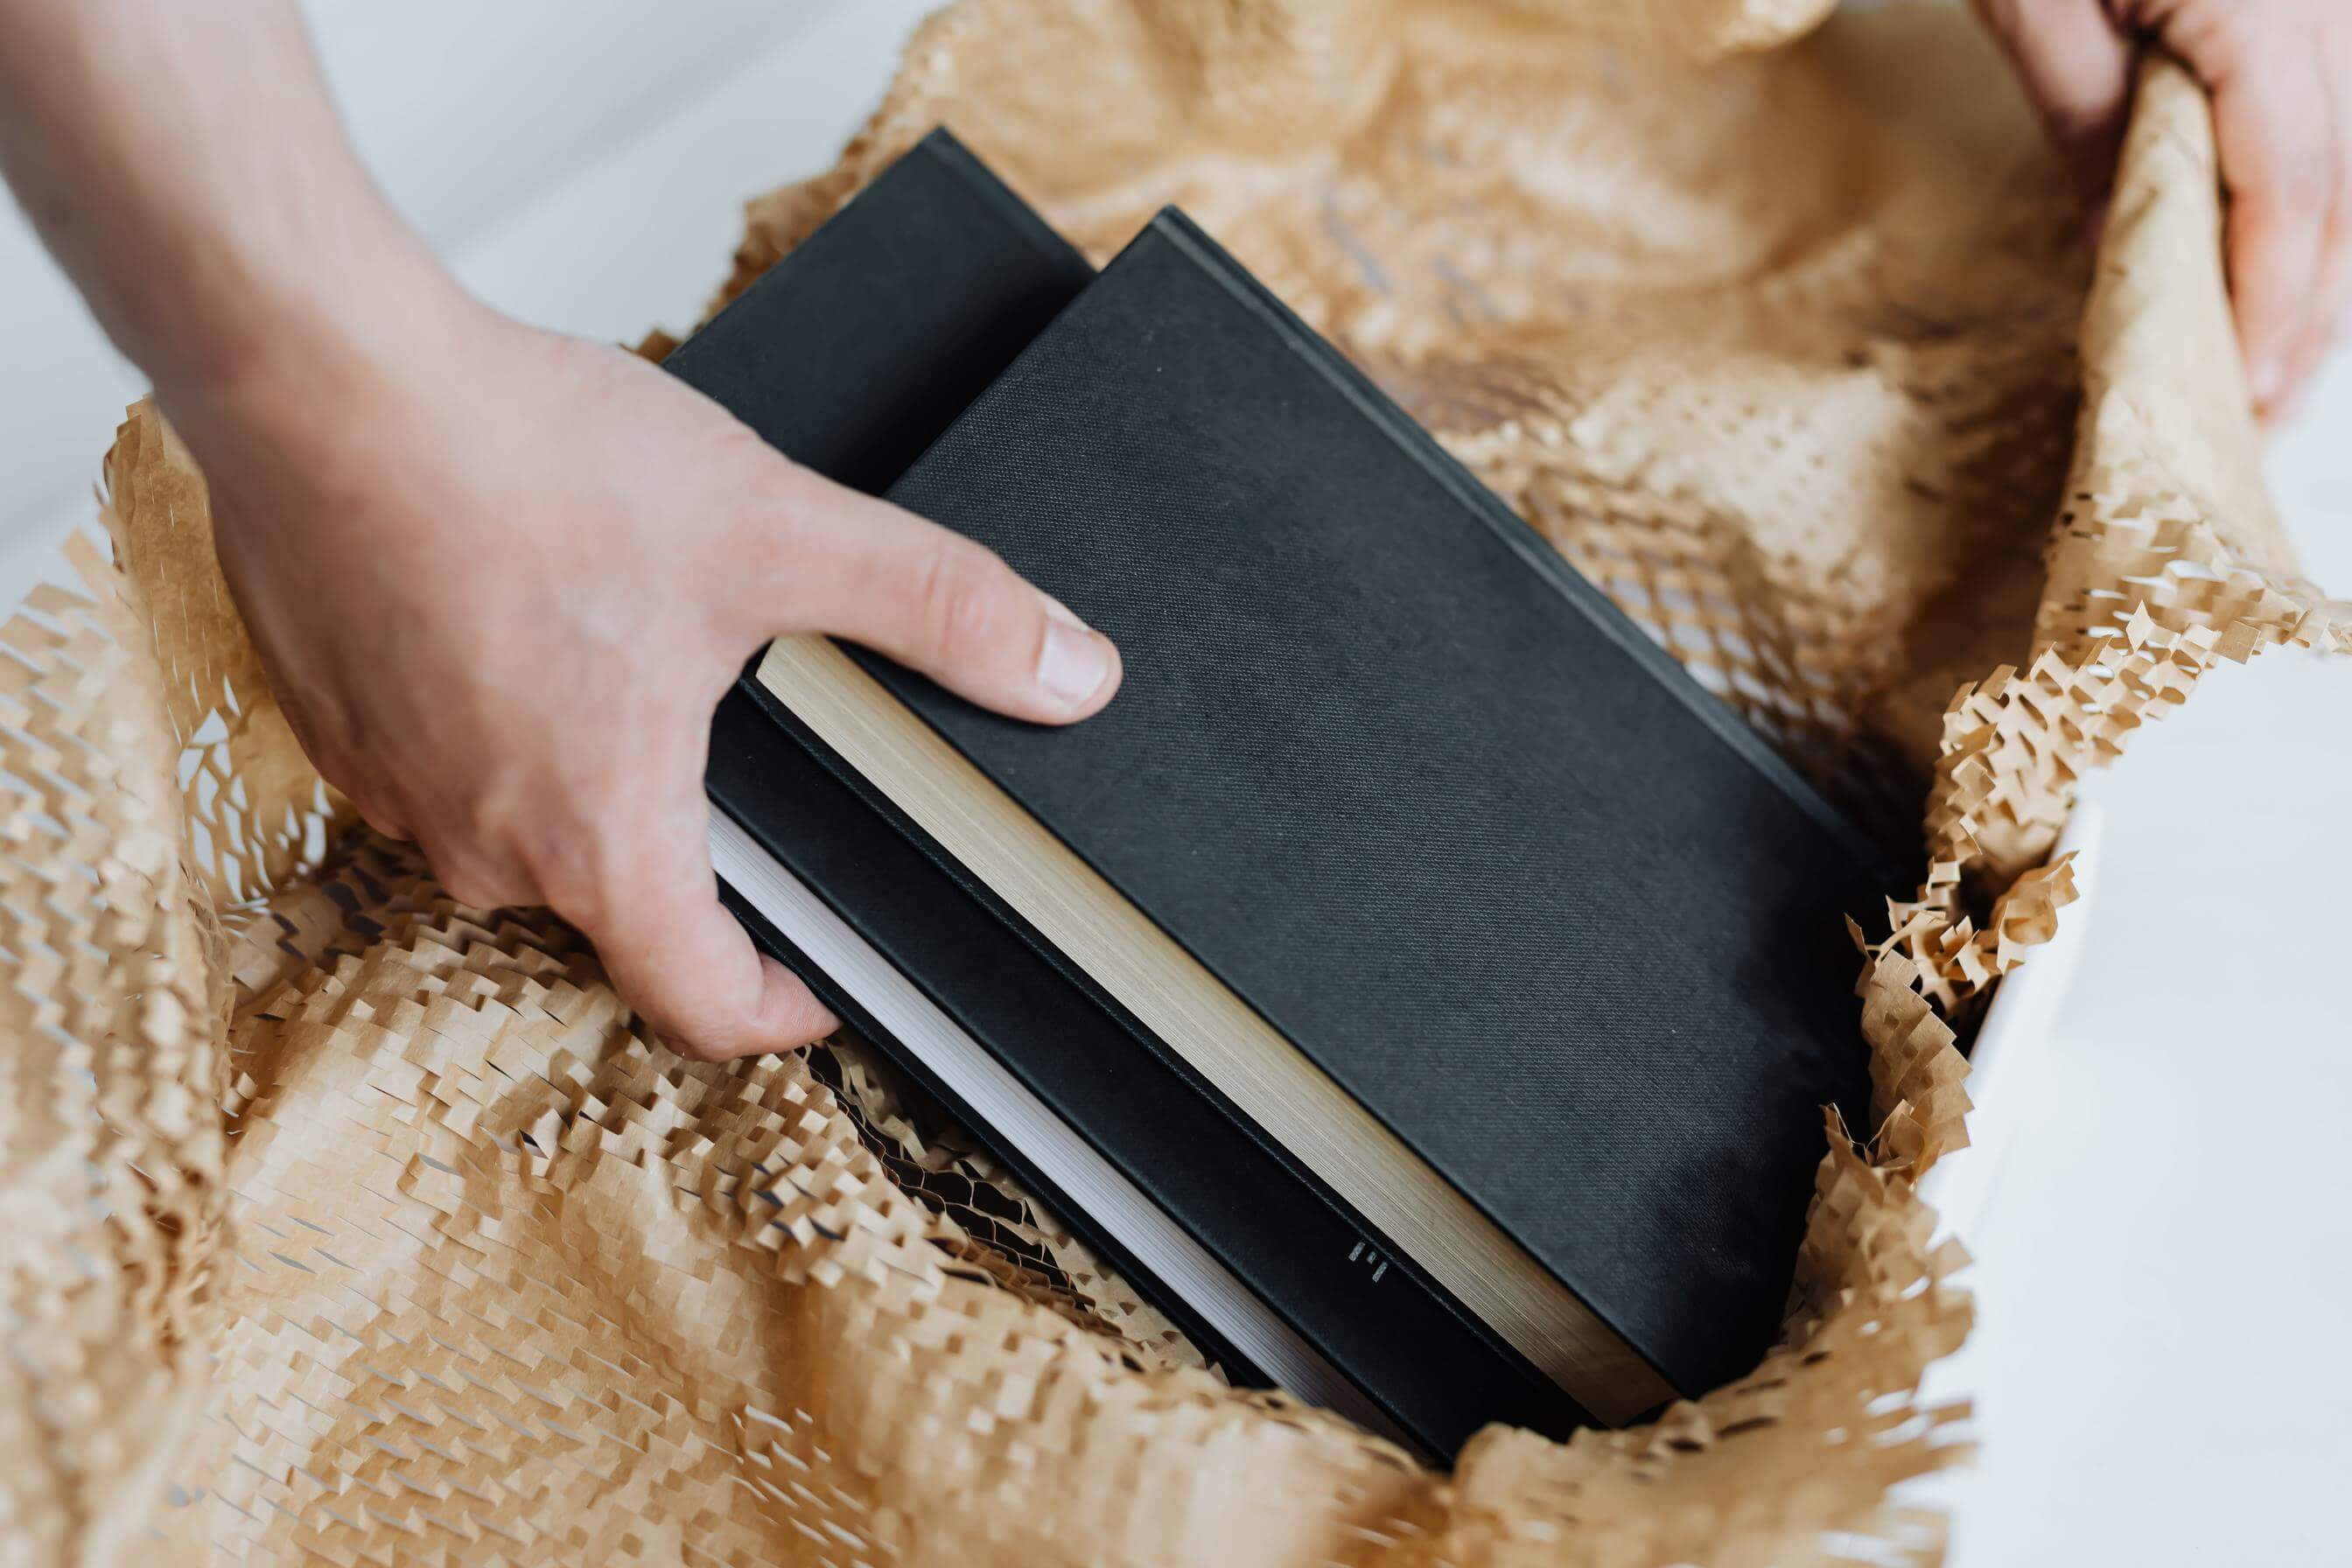 Placing books into a box